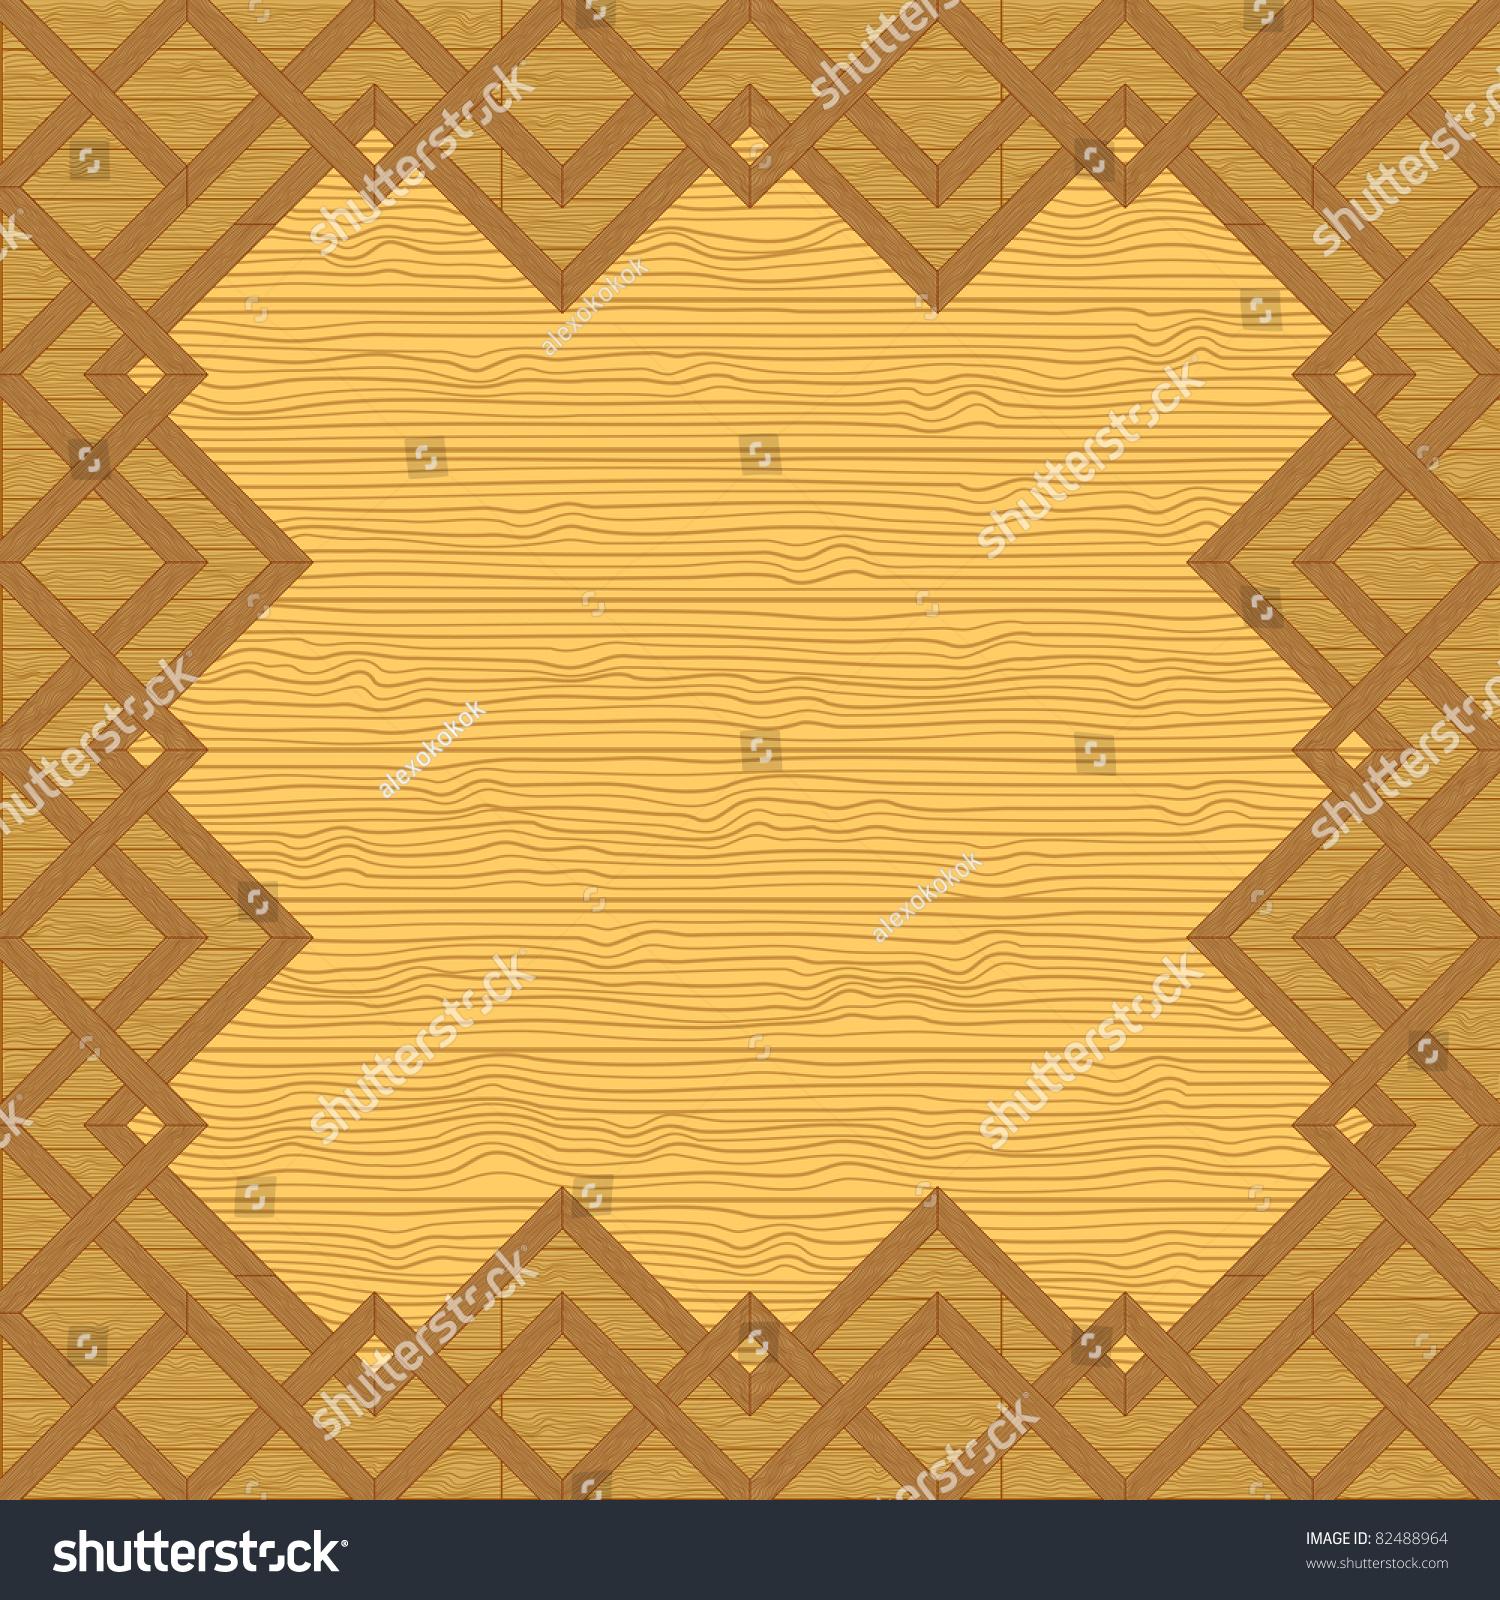 Vector Ornate Decorative Wooden Frameworks On Stock Vector 82488964 ...